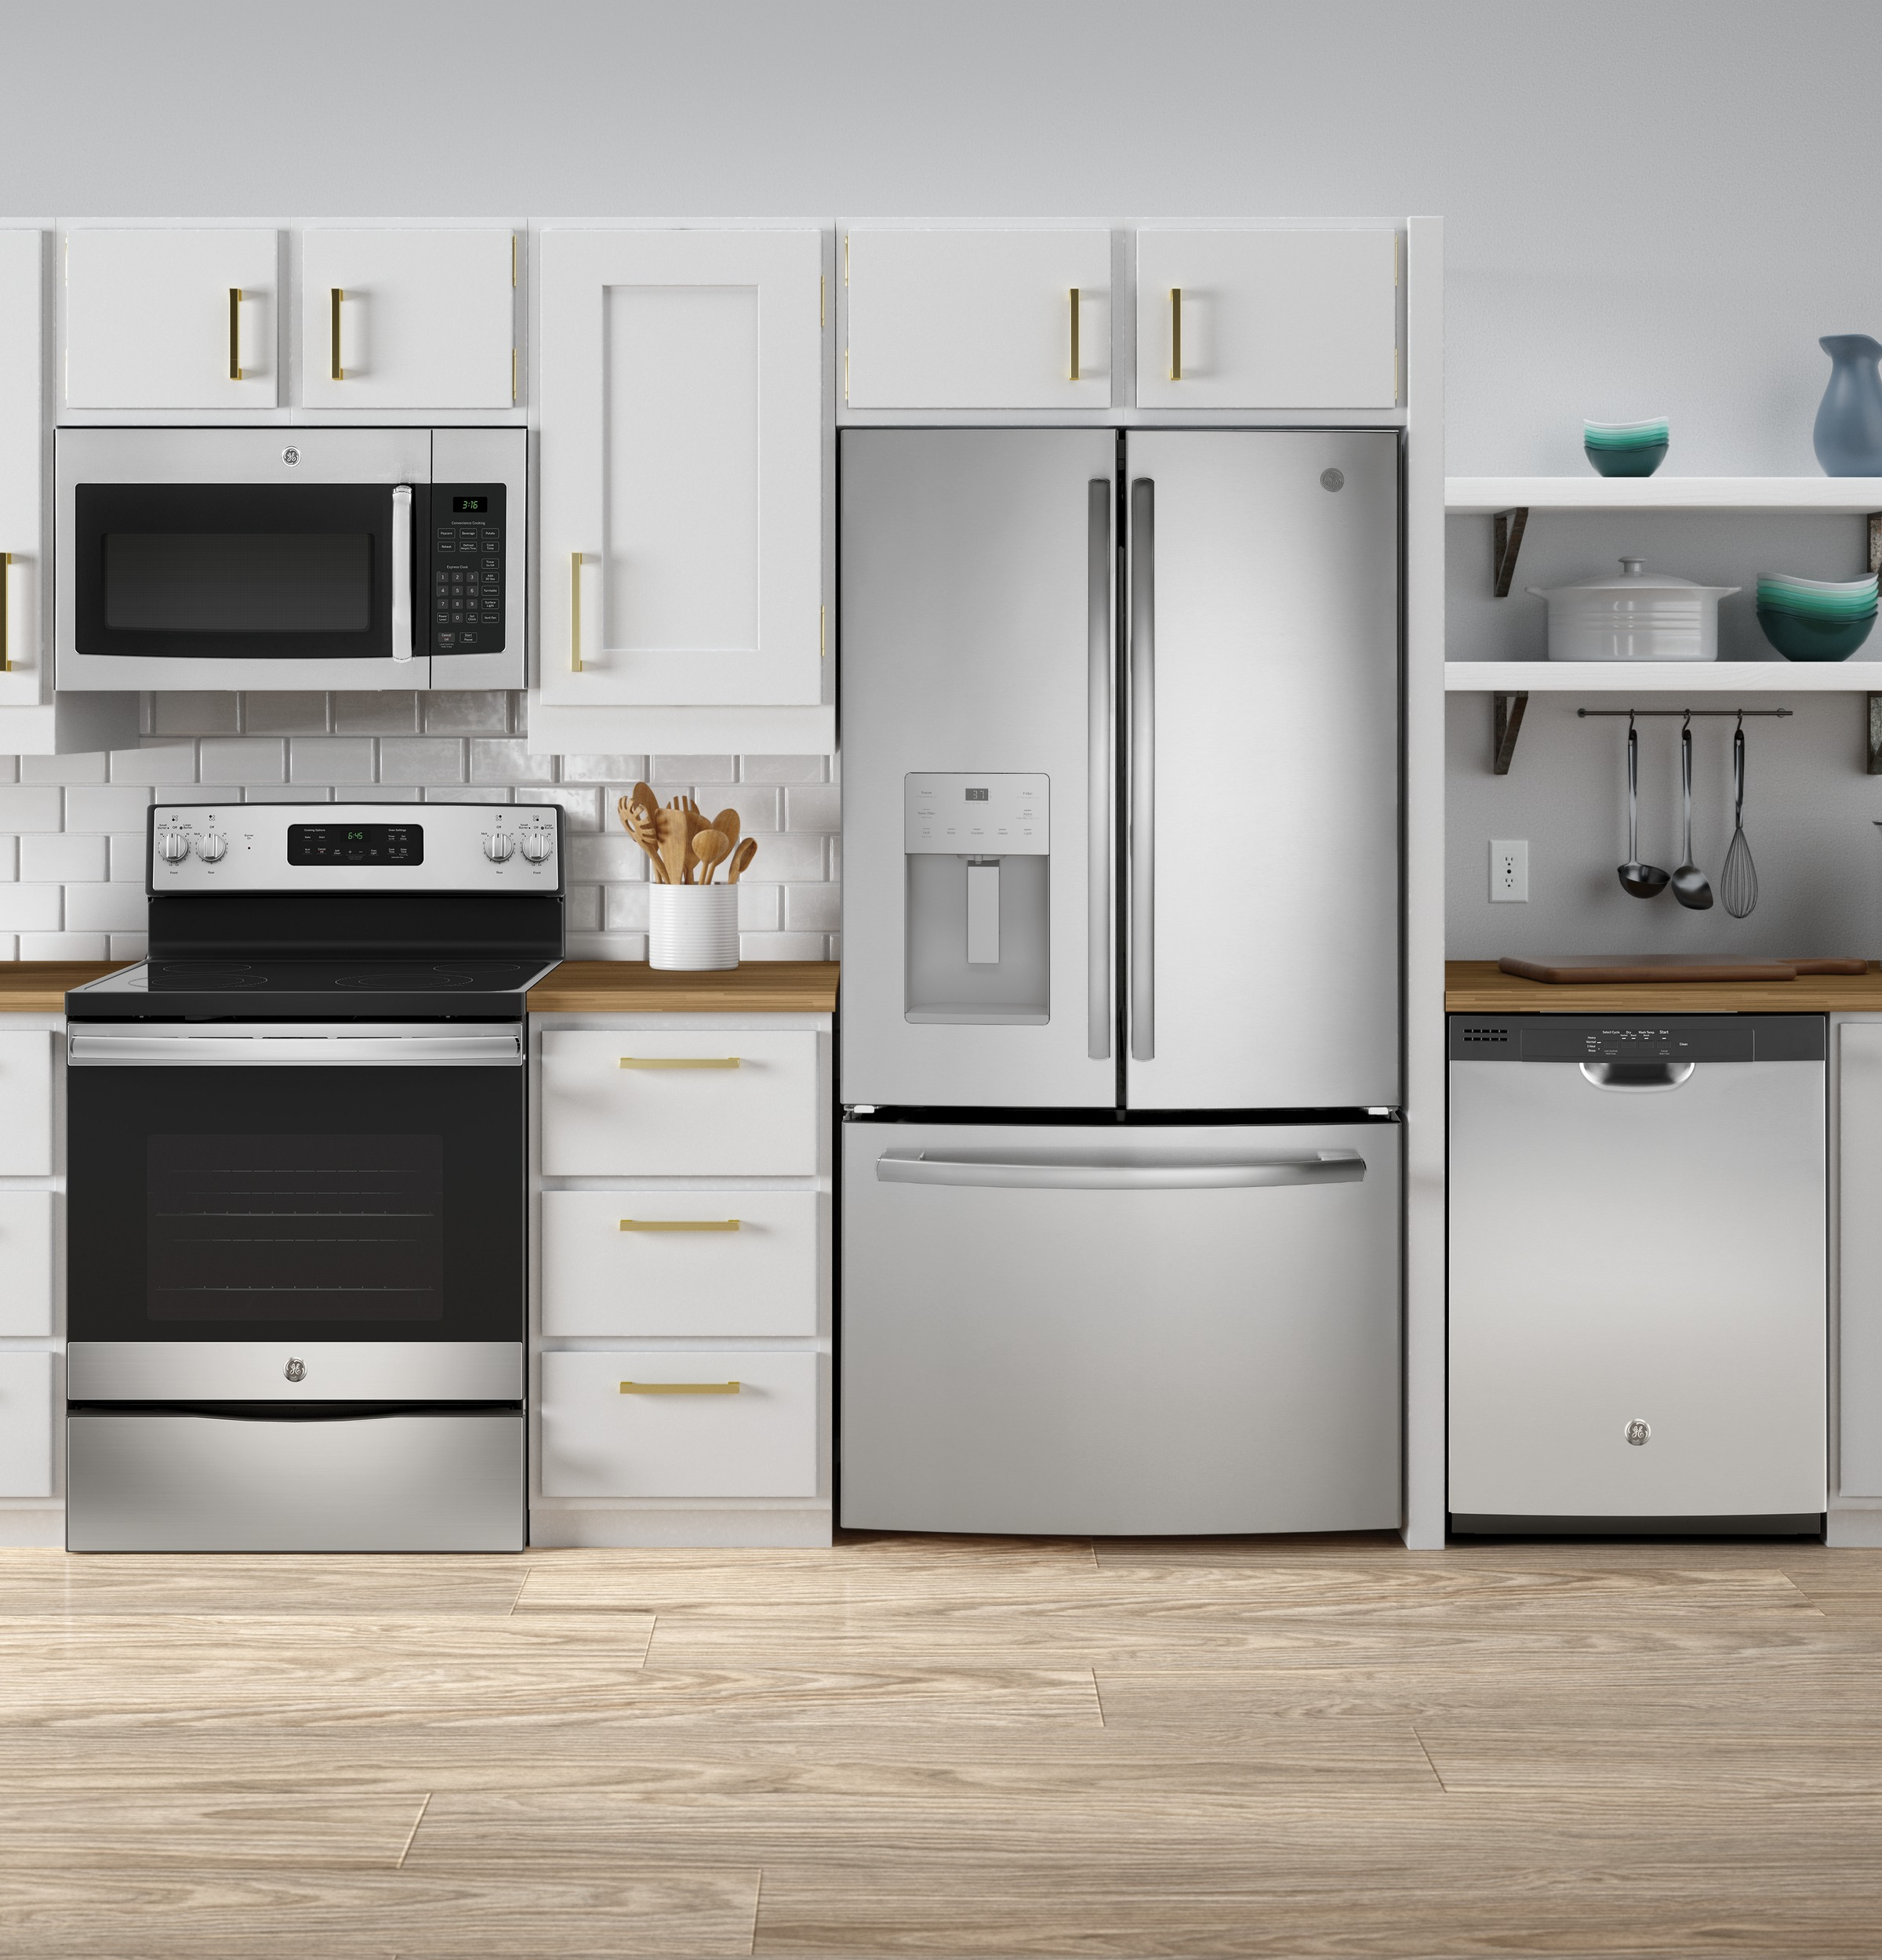 robert stevens appliances